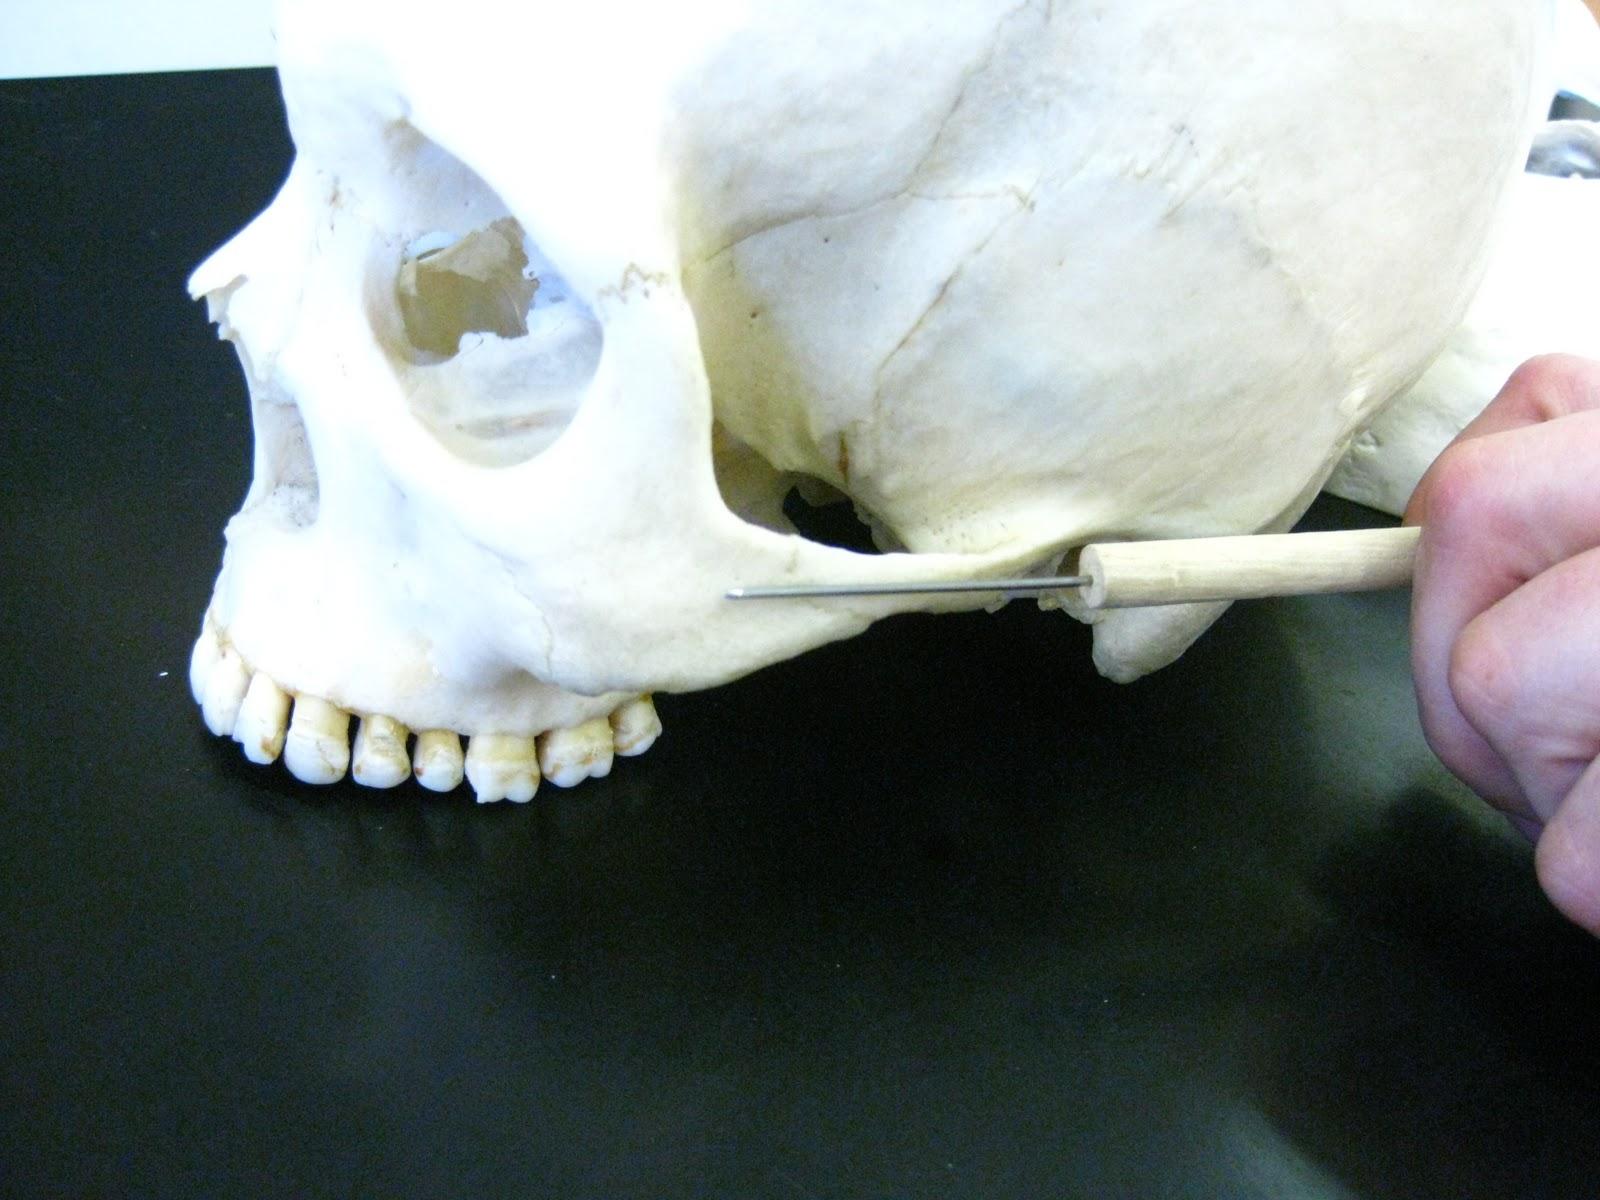 Boned: Human Skull - zygomatic arch (union of zygomatic ...